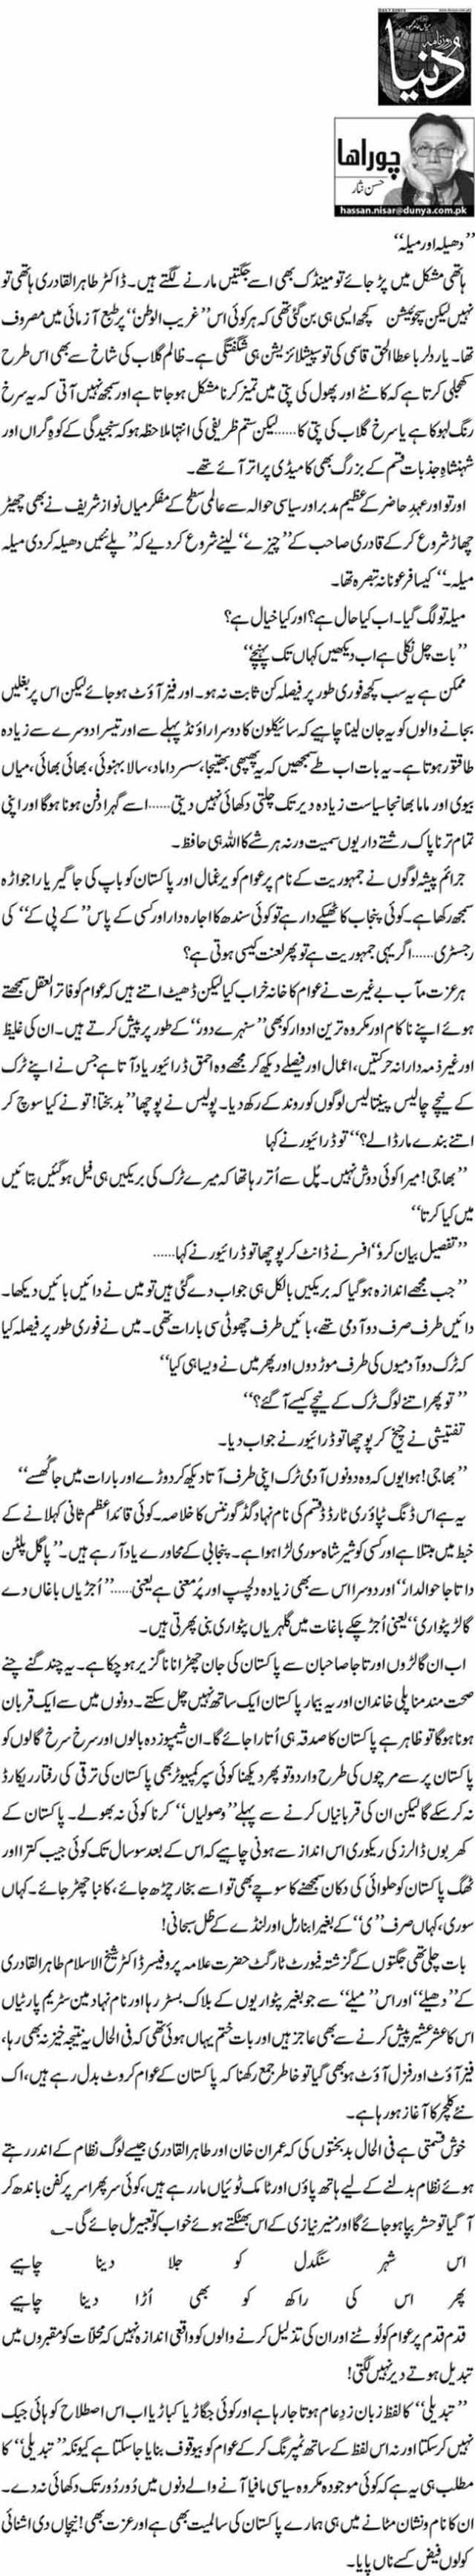 """Dheela aur Meela"" - Hassan Nisar"